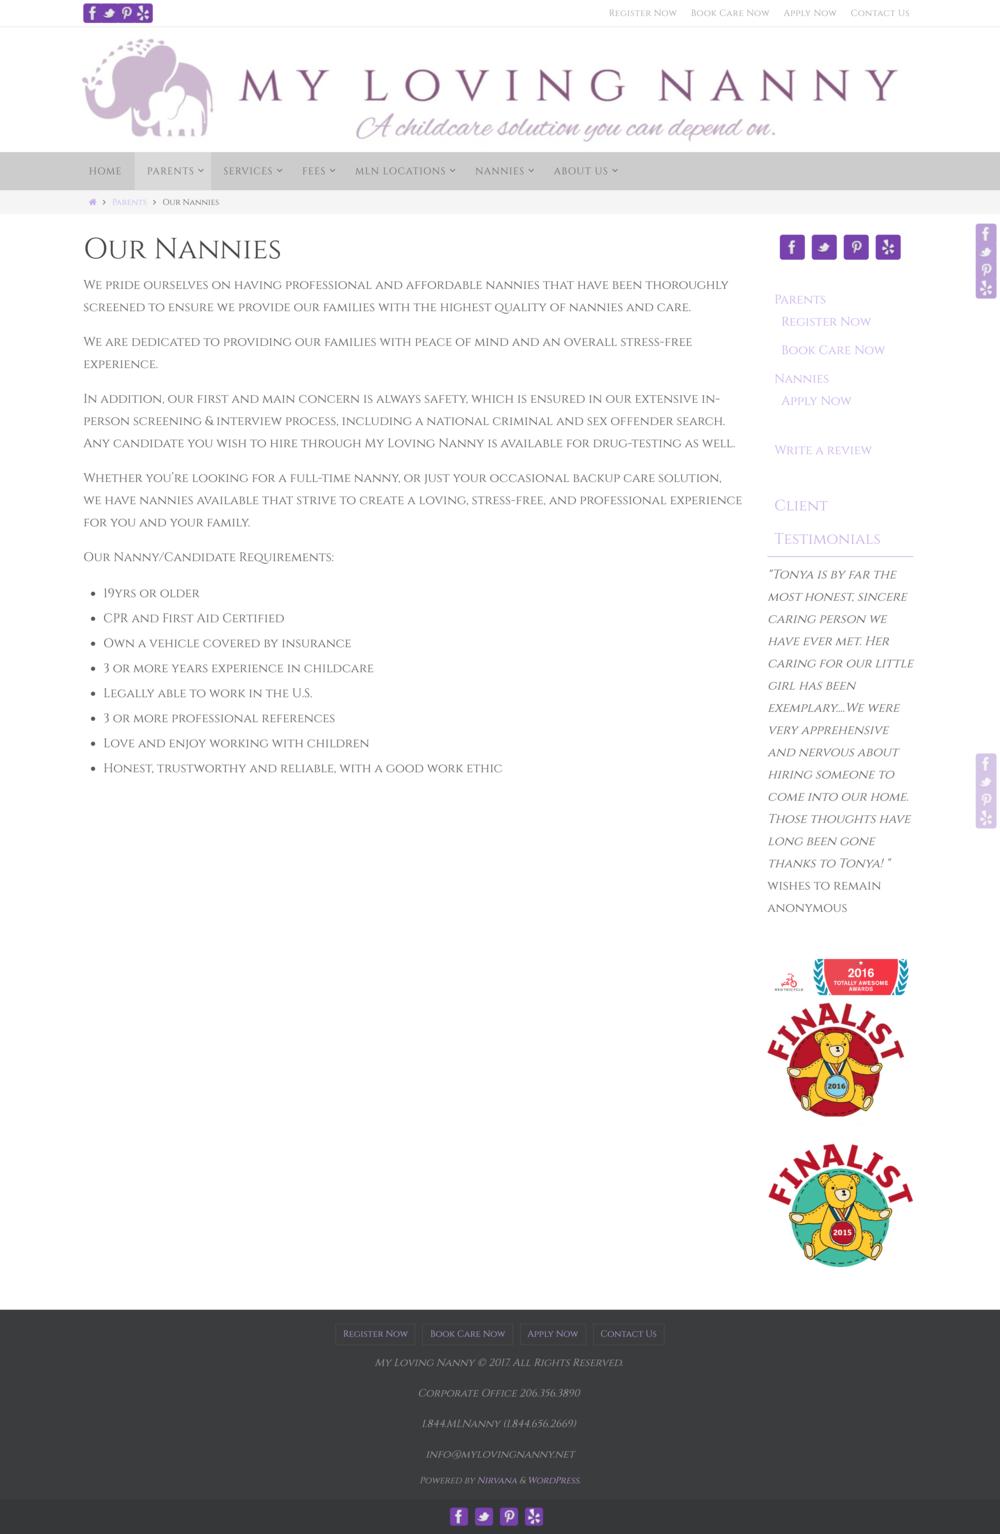 06_Nannies Requirements.png